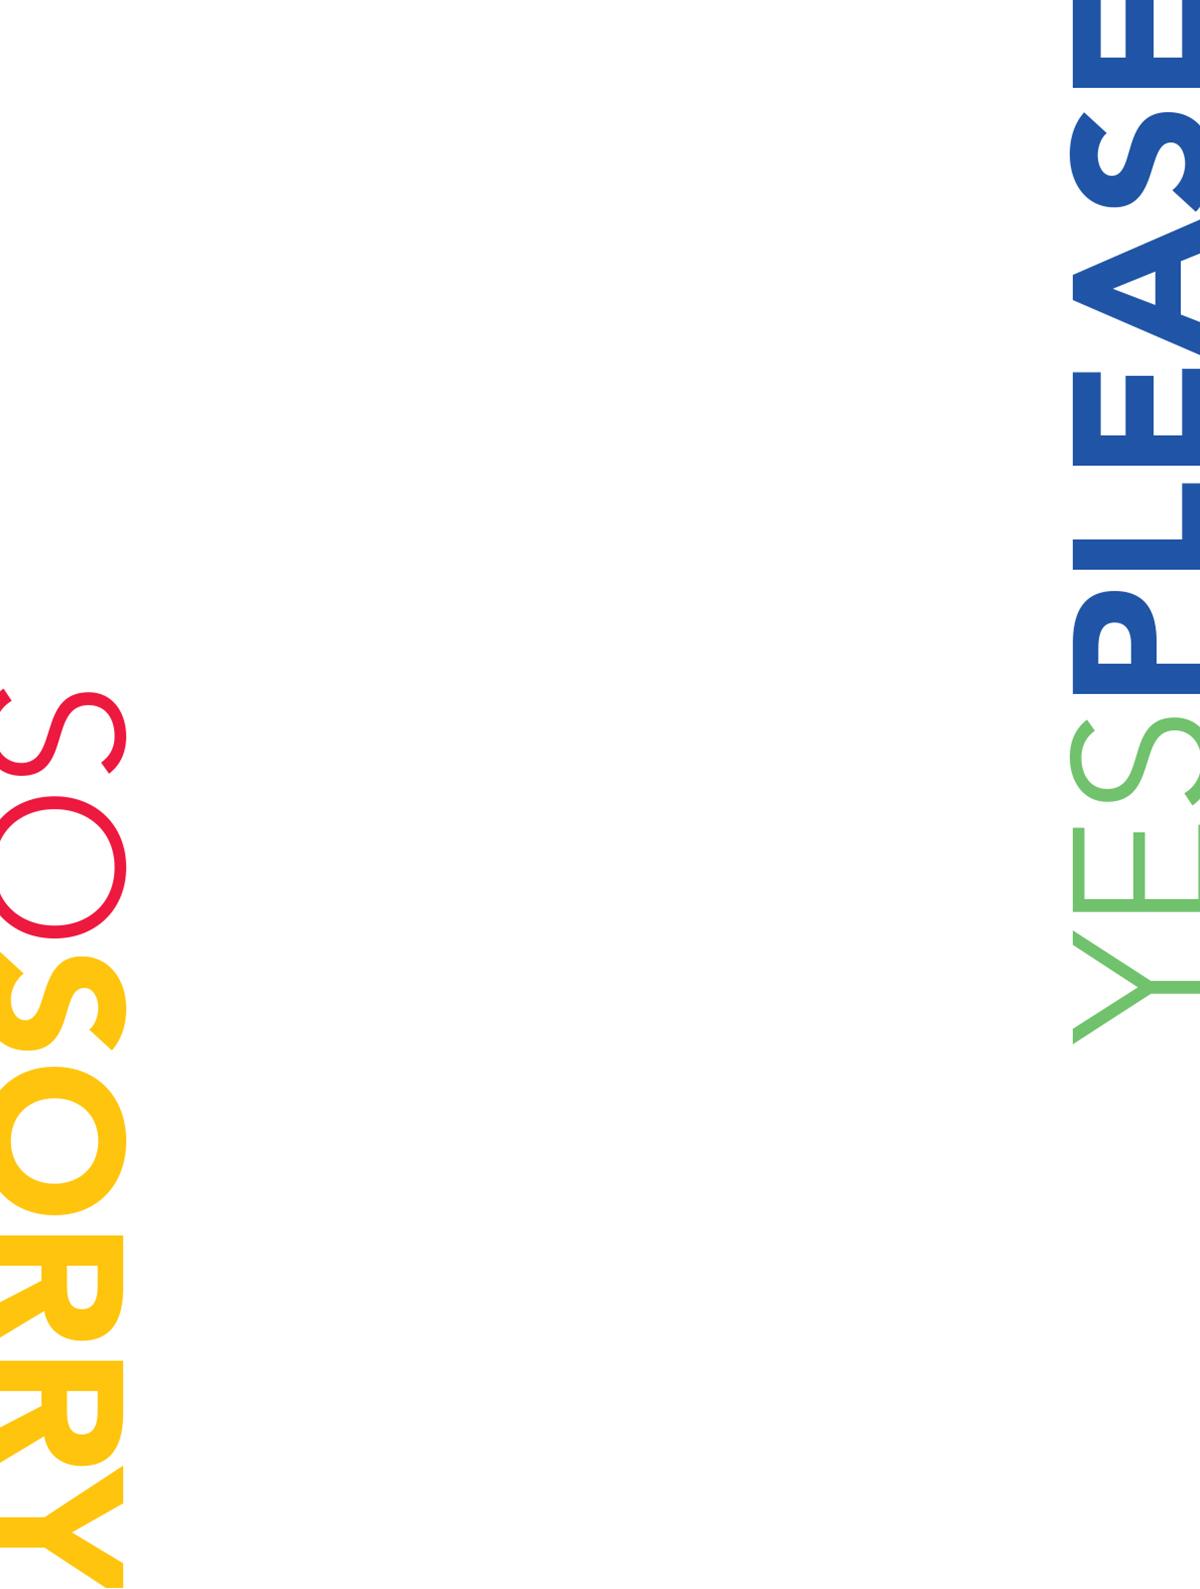 CorbinDances 2011 Invitation - RSVP Card Front